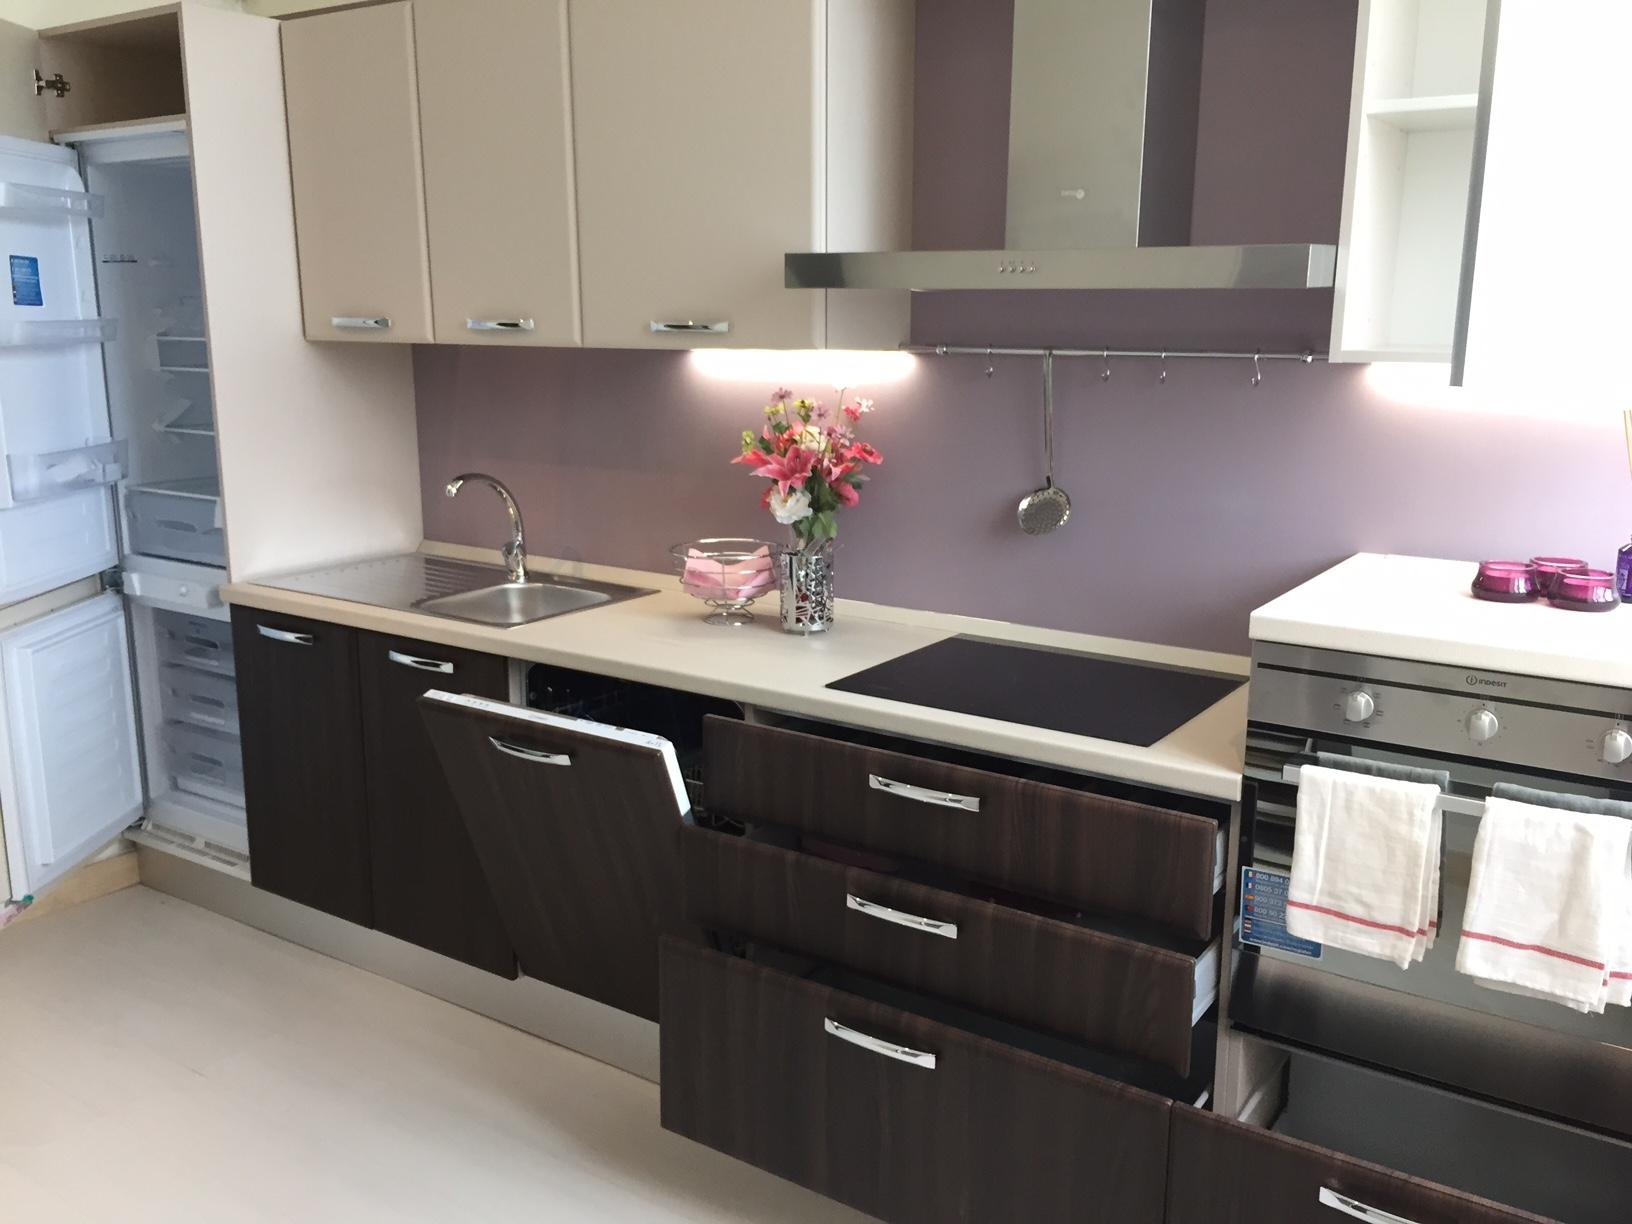 Cucina creo kitchens britt olmo cotto moderna for Cucina moderna prezzi